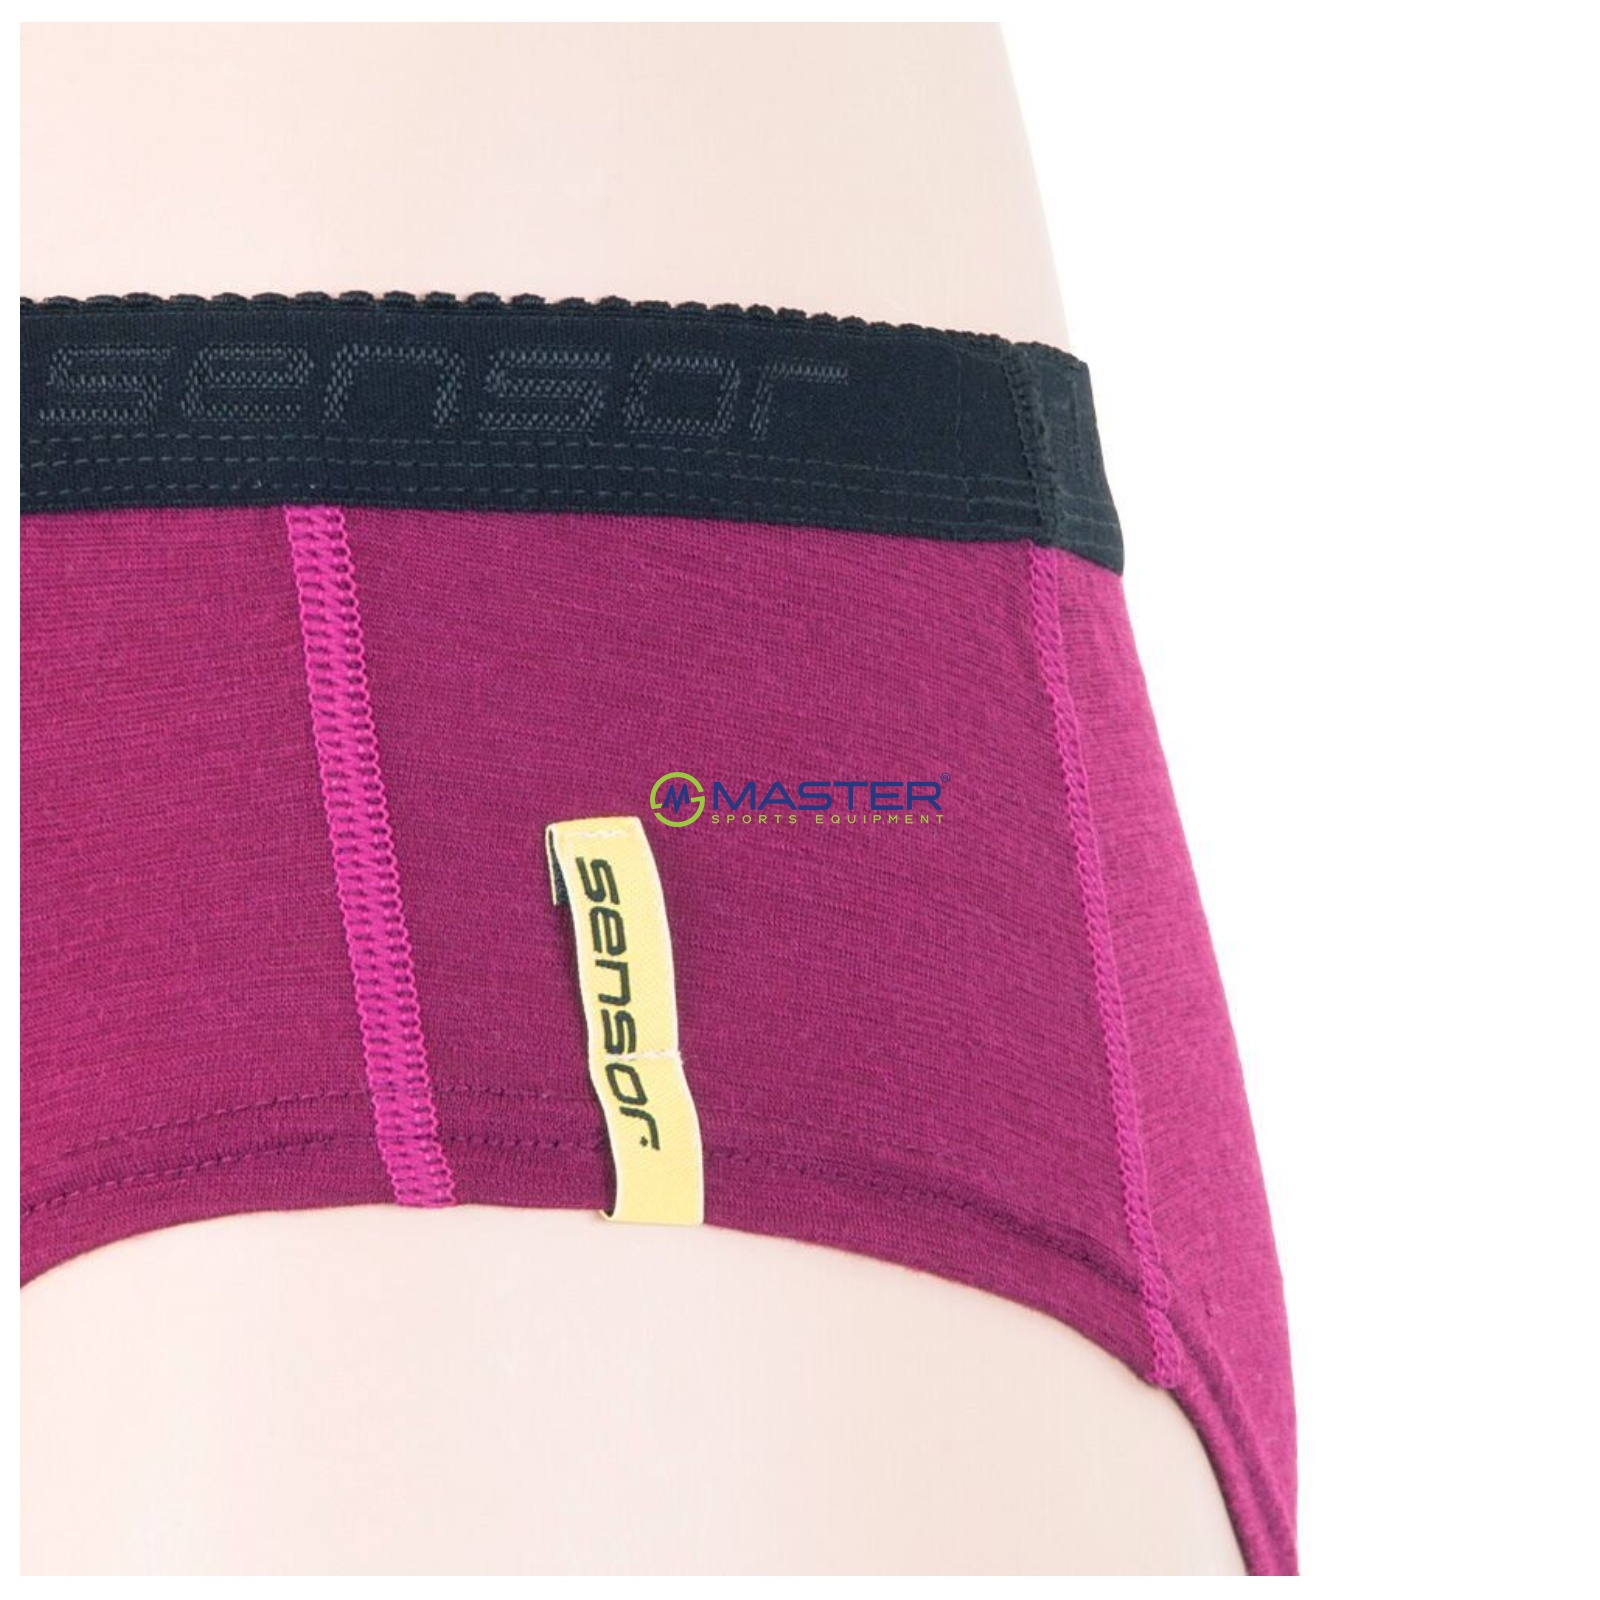 Kalhotky SENSOR Merino wool Active lilla. -15% 6fc80602b2